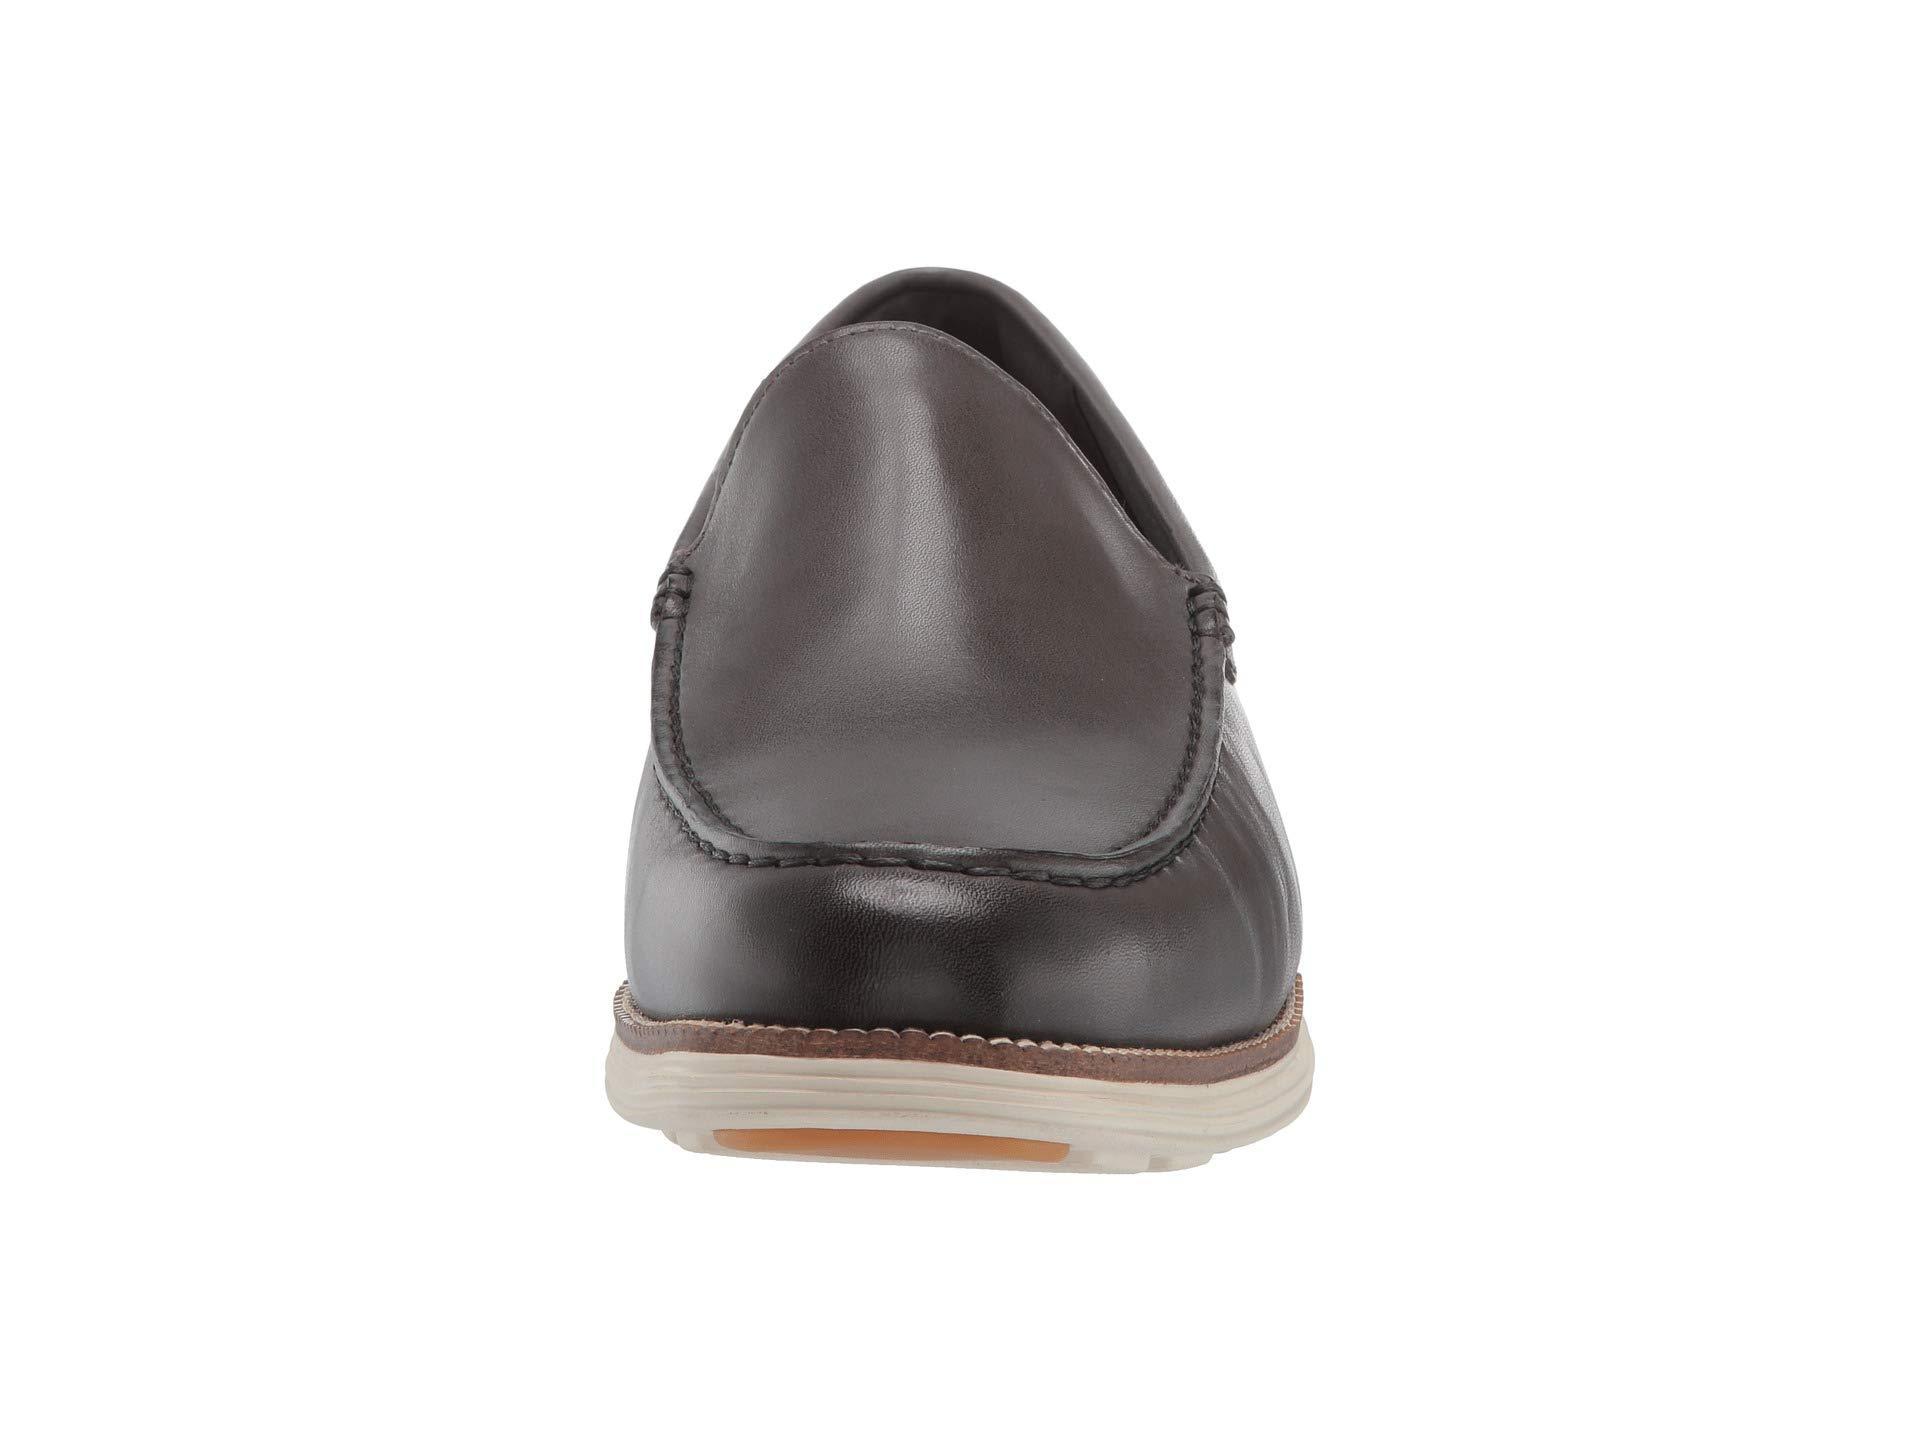 7f2cf825239 Lyst - Cole Haan Original Grand Venetian (magnet Leather ivory ...